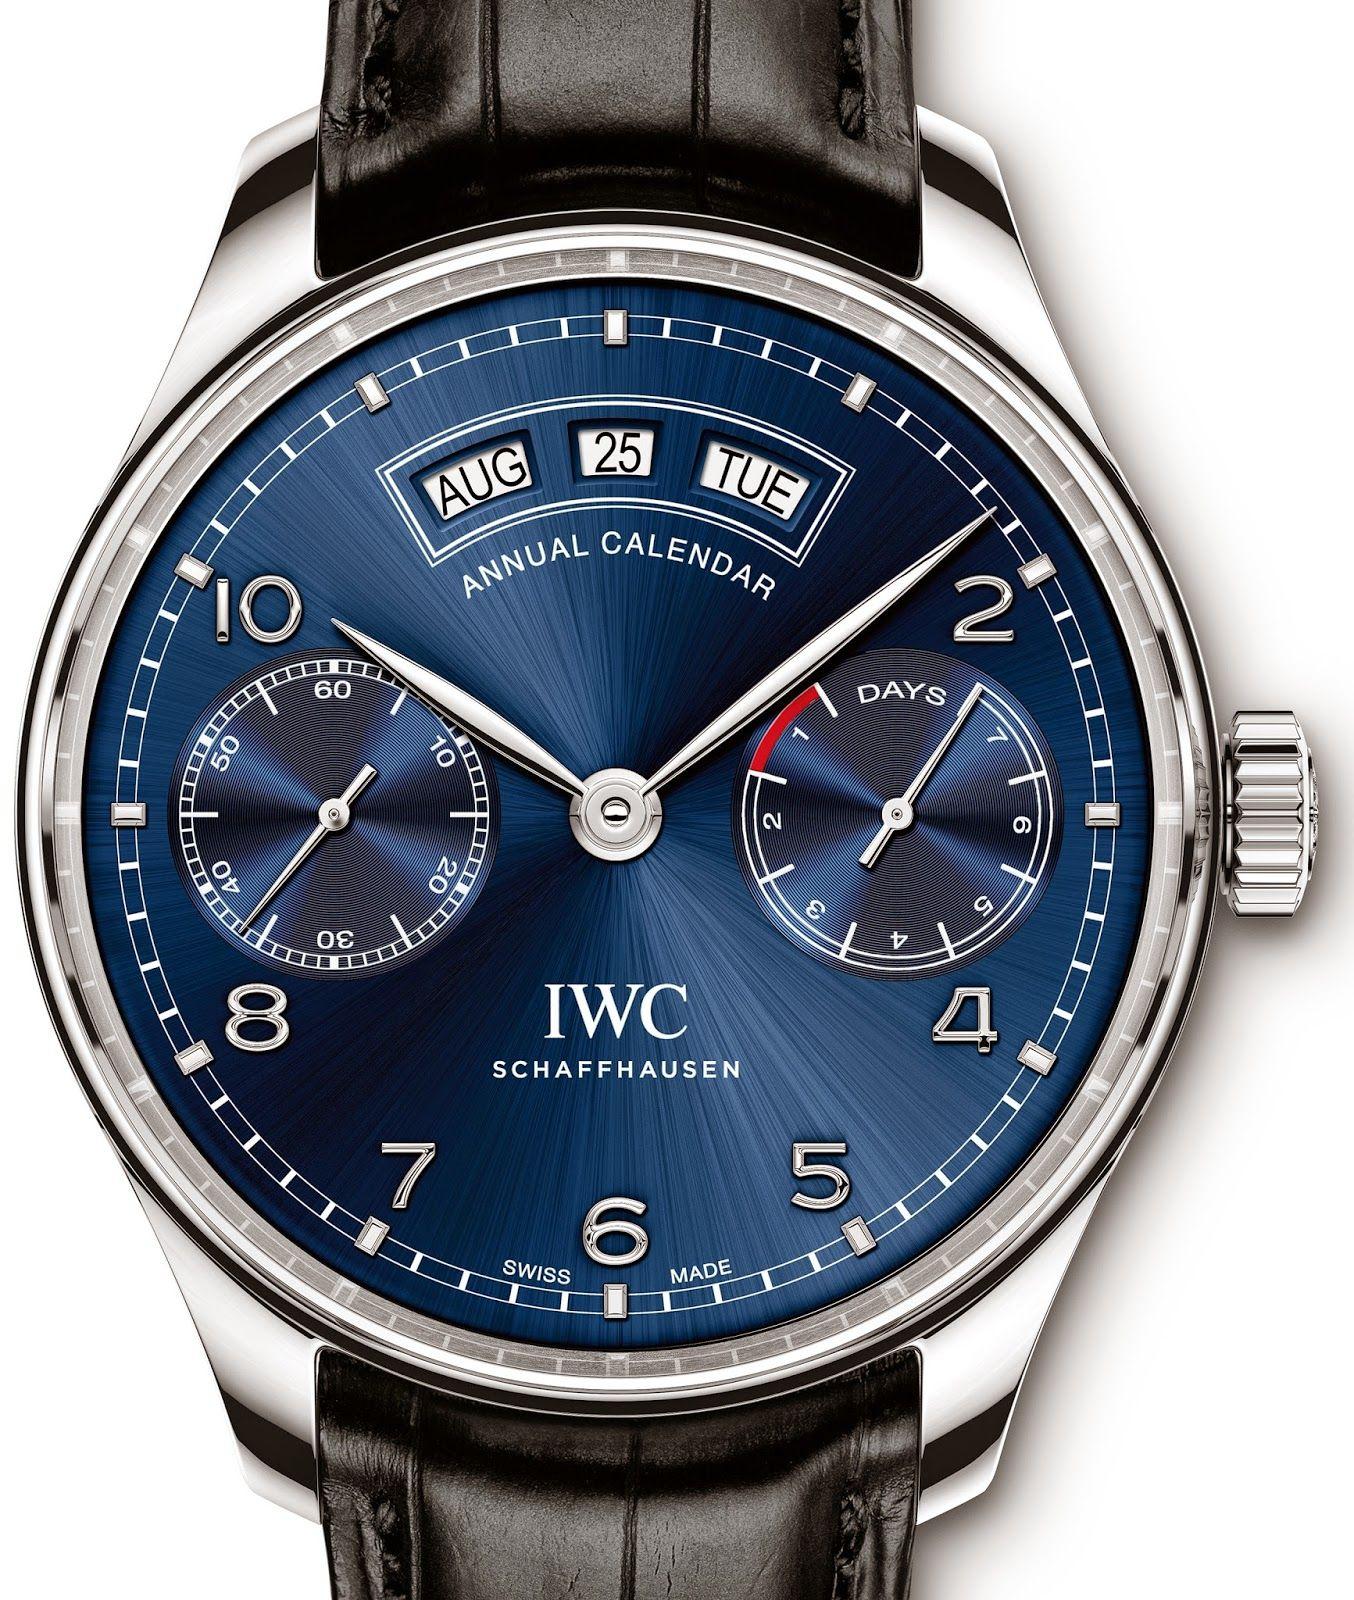 IWC Portugieser Annual Calendar Watch Review.  #IWC #luxury #watches